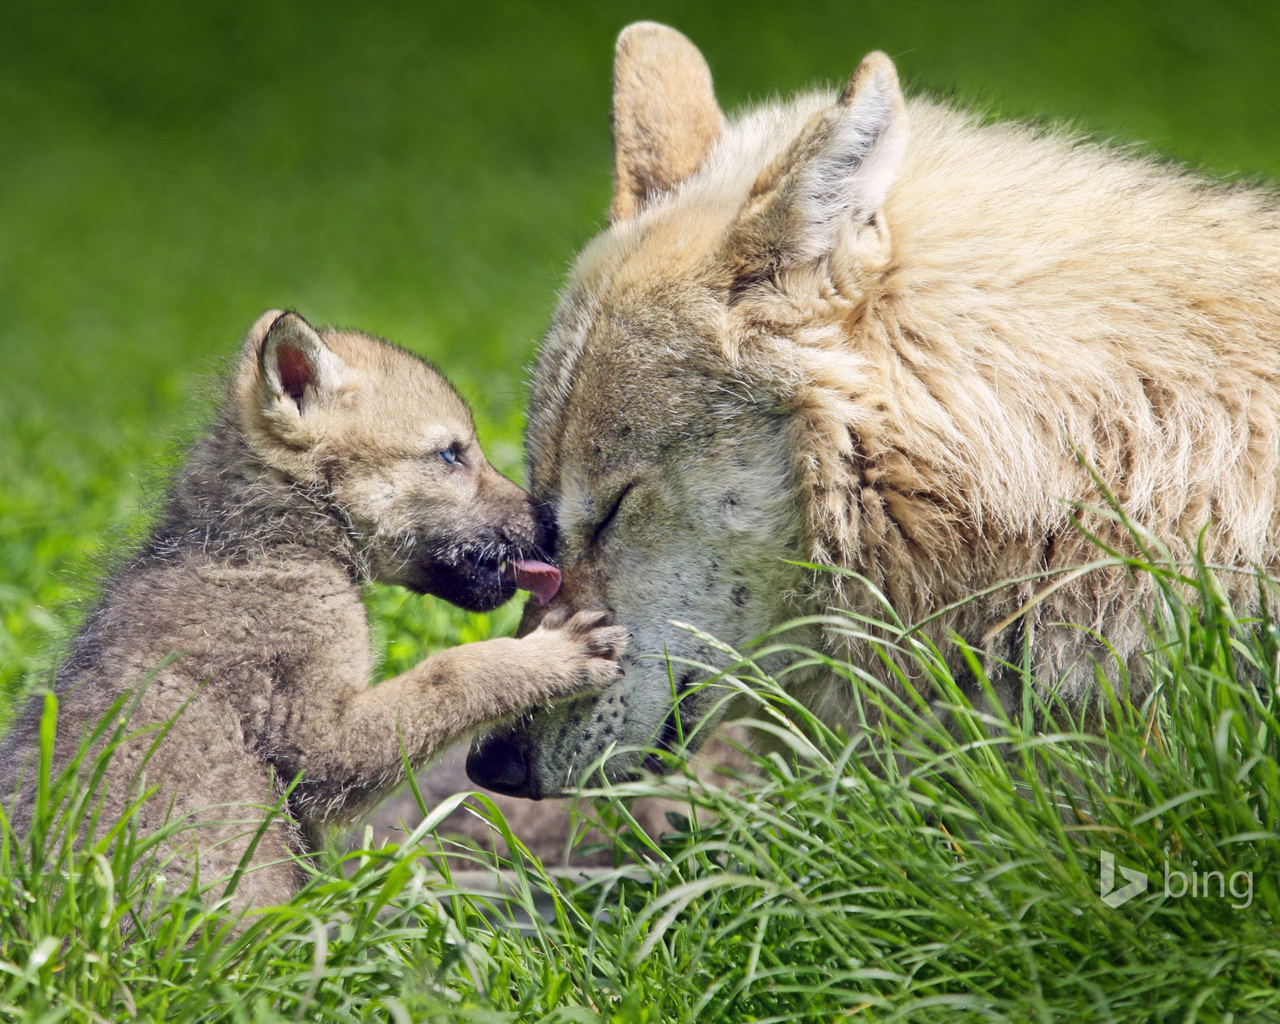 животные, хищники, волки, волк, волчица, волчонок, детёныш, природа, лето, трава